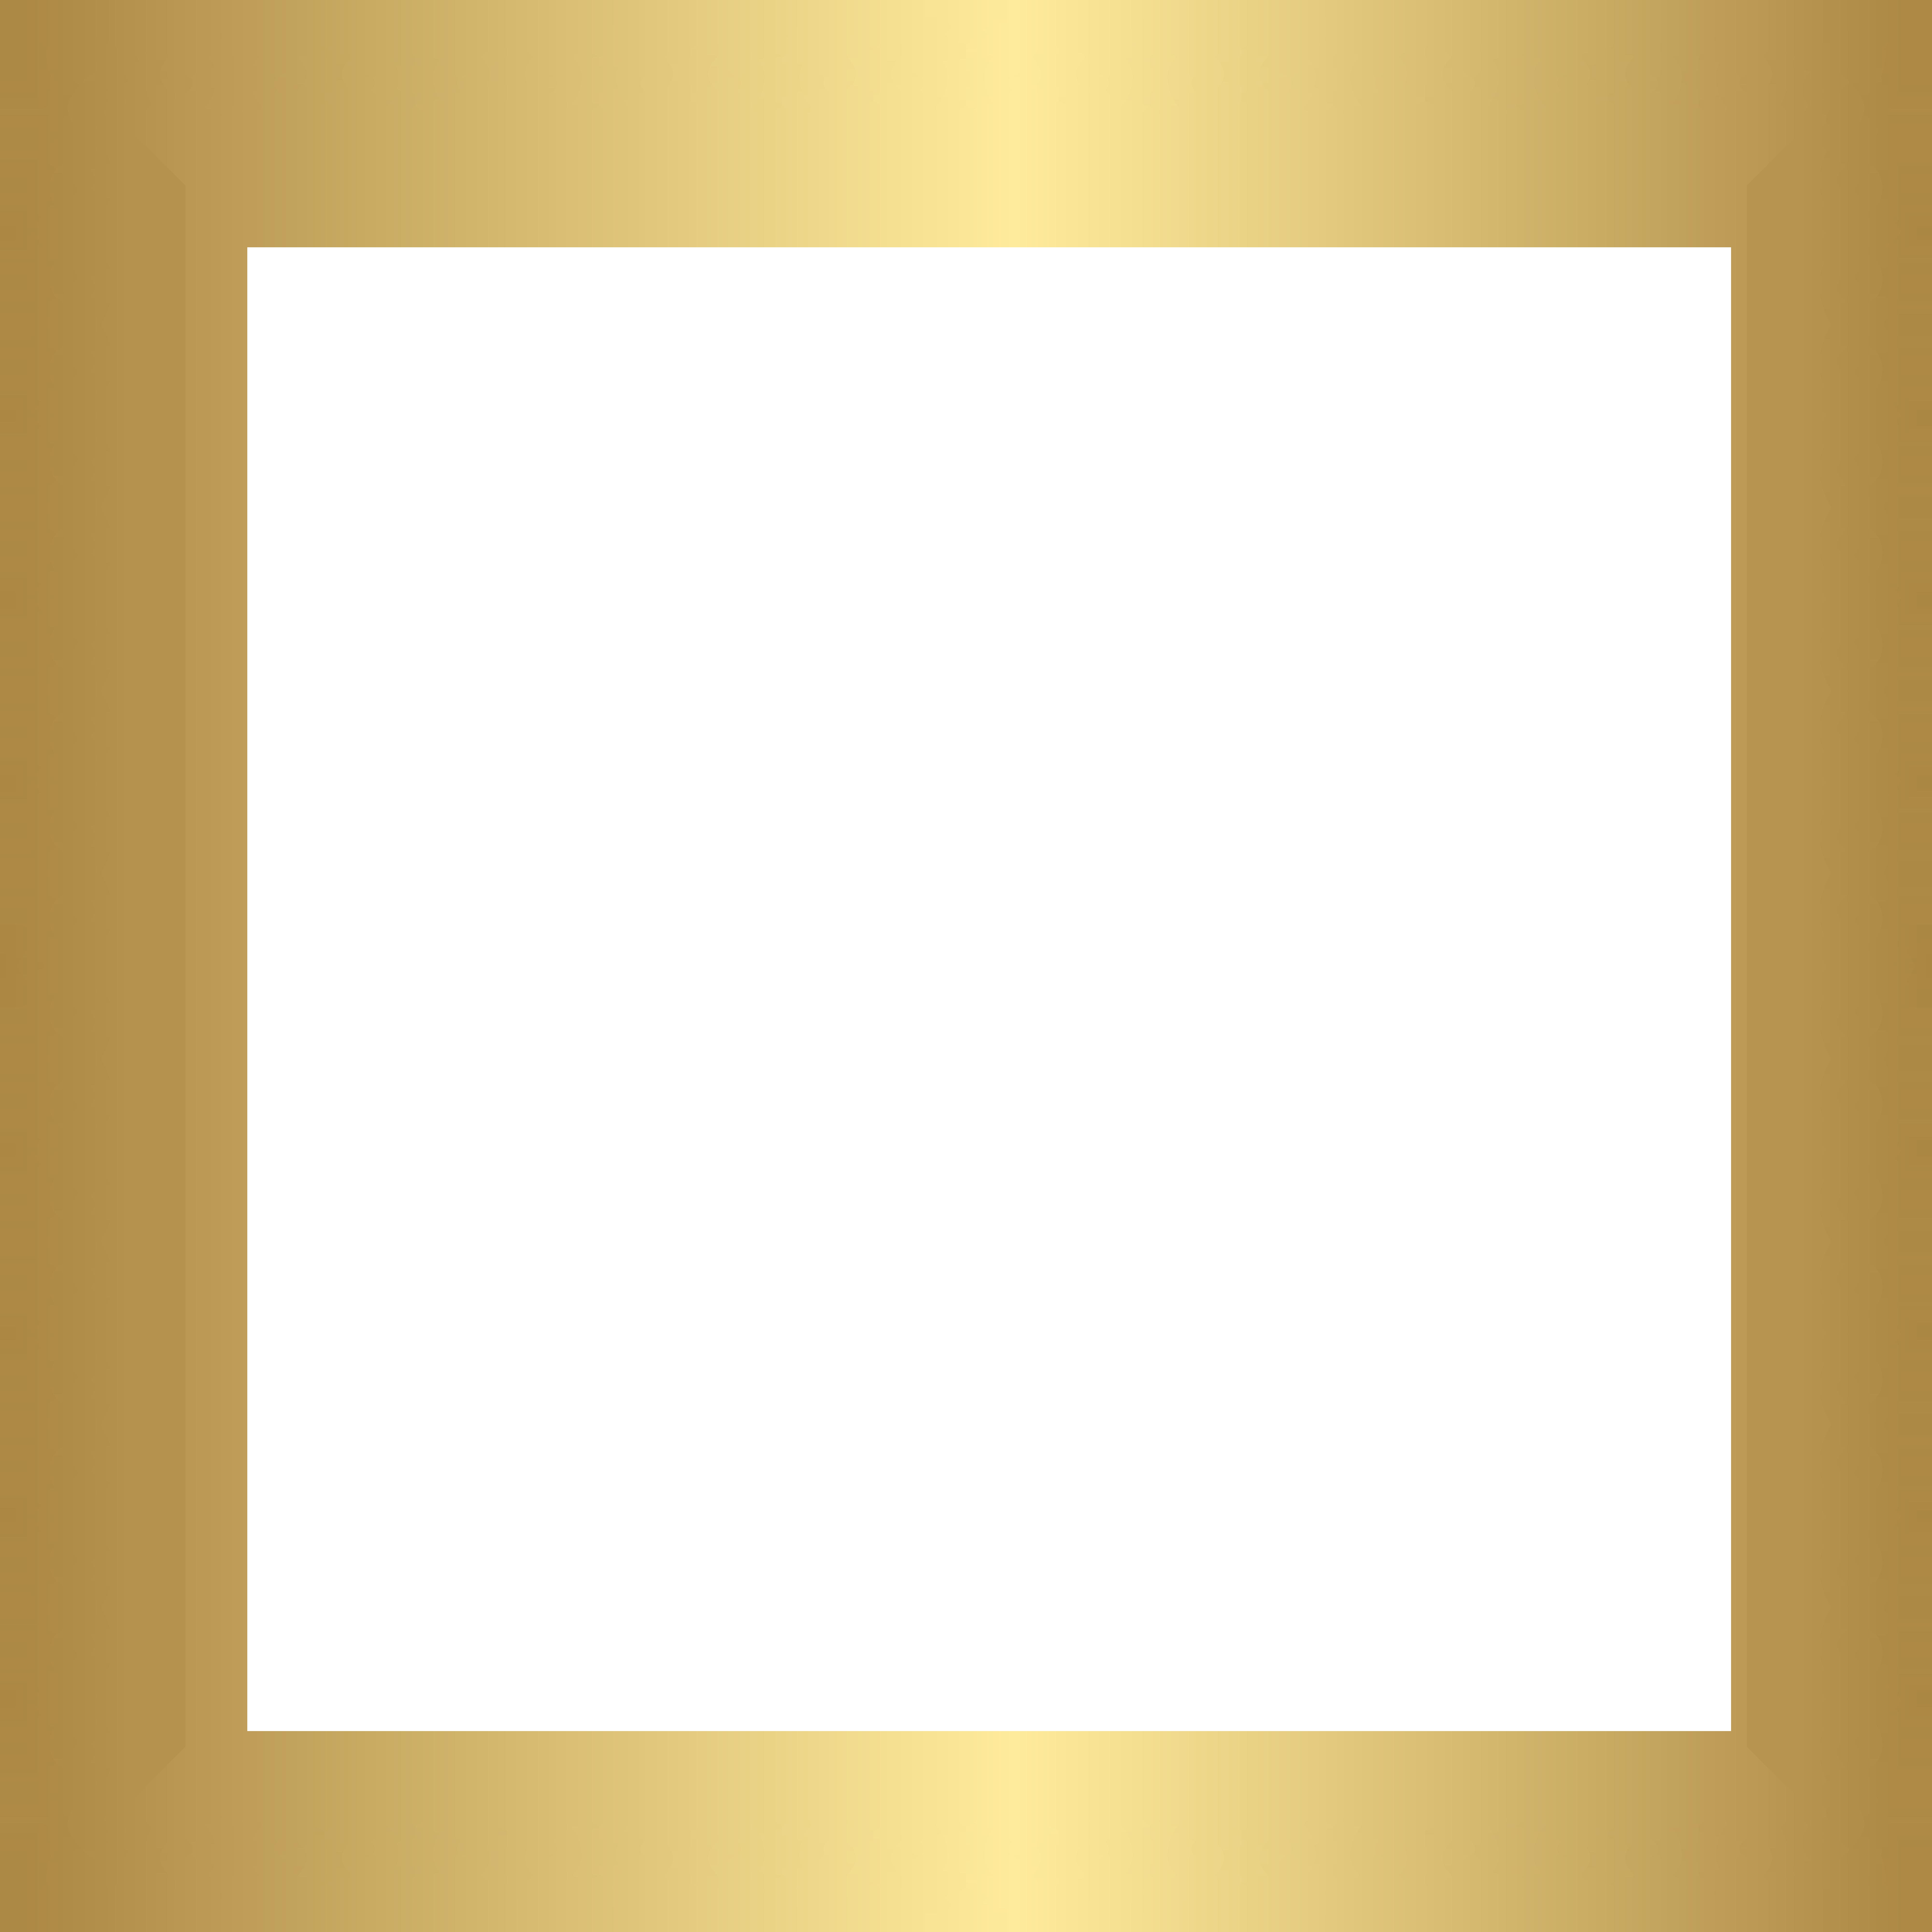 8000x8000 Transparent Border Frame Gold Png Clip Artu200b Gallery Yopriceville